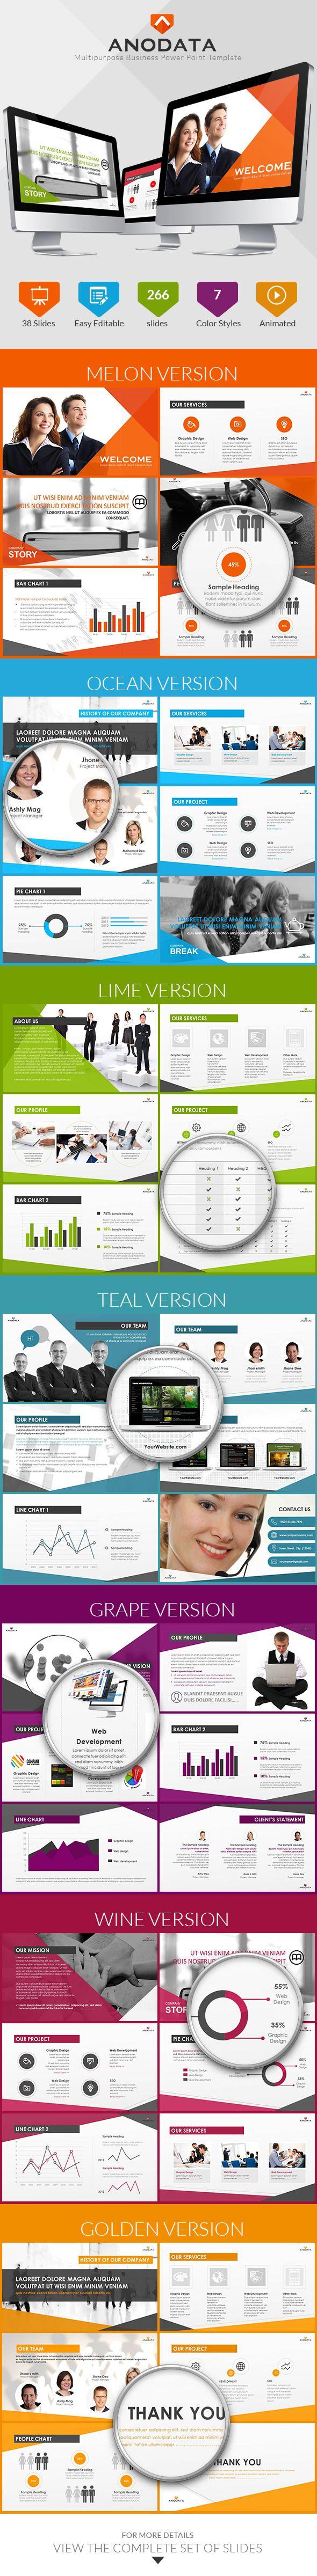 best 25+ power point templates ideas on pinterest | power point, Presentation templates